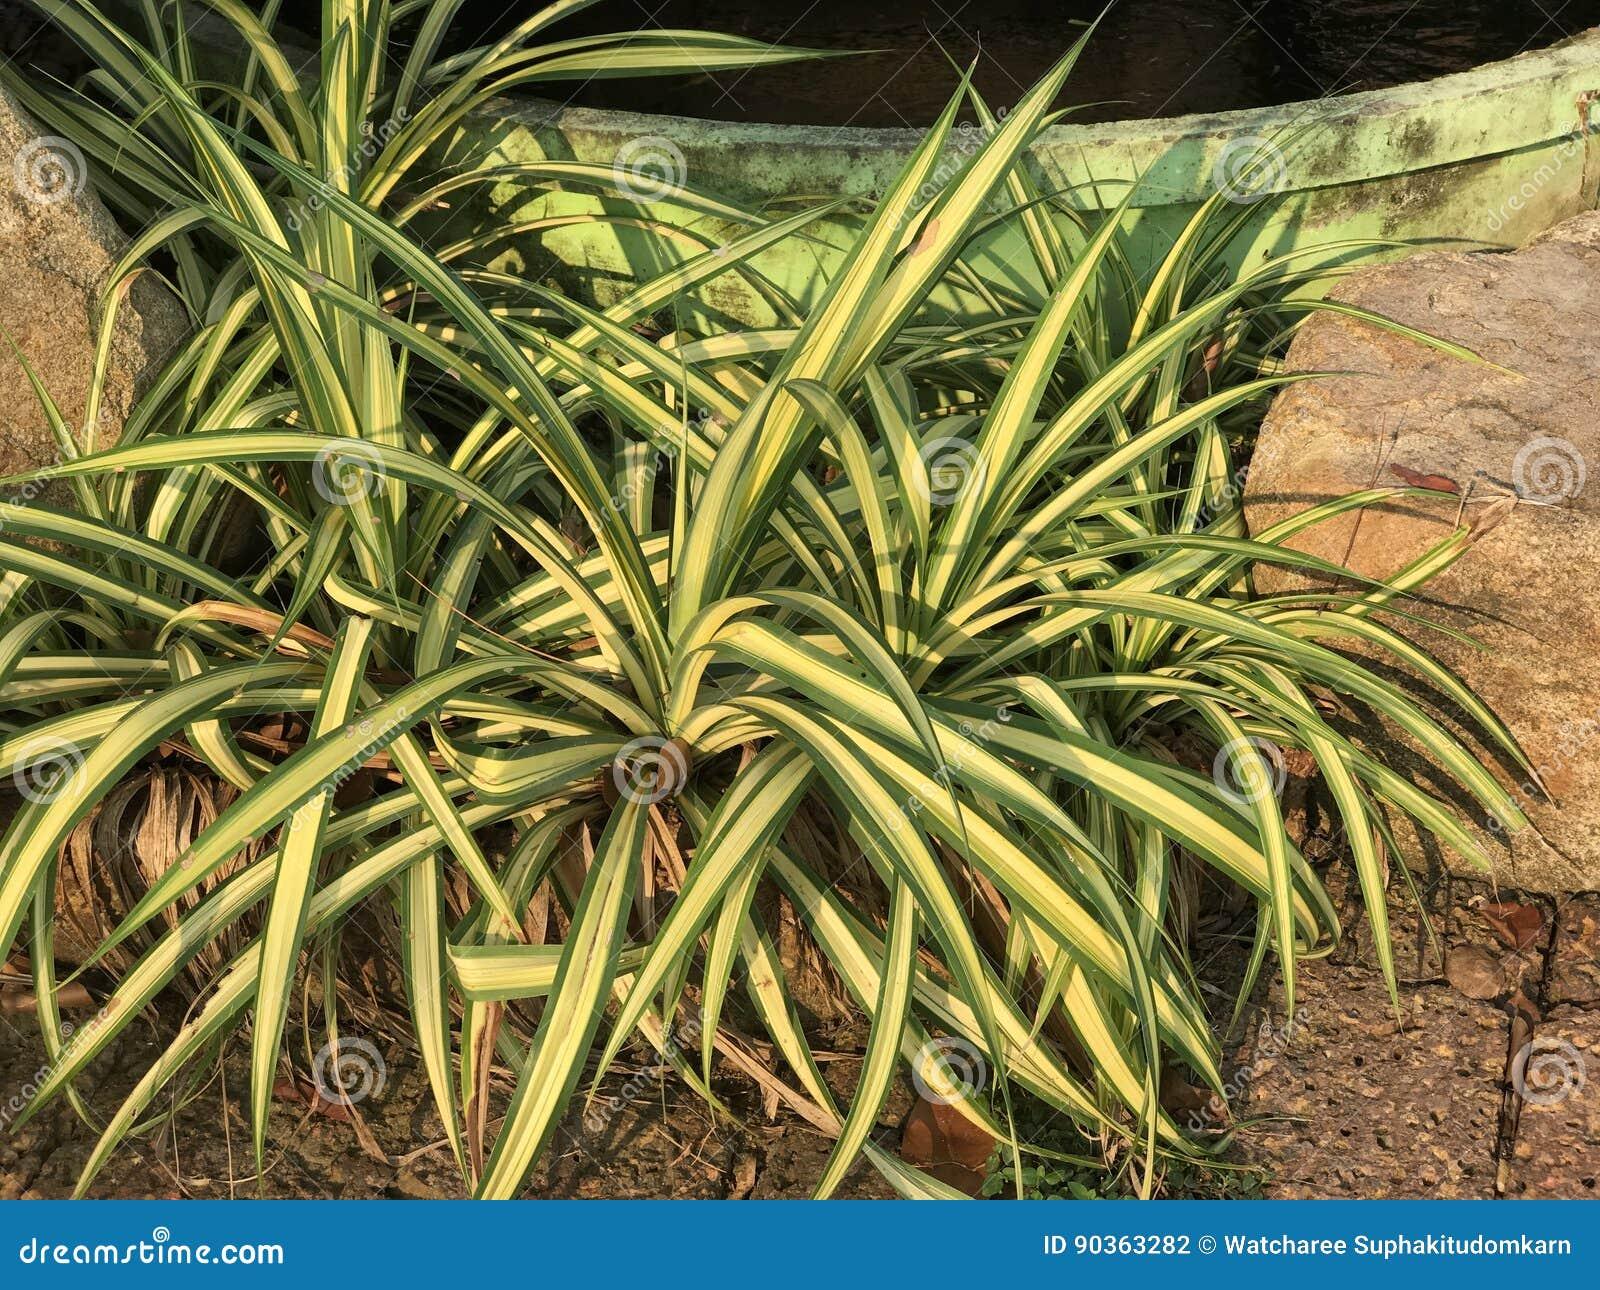 chlorophytum spider plant stock photos images u0026 pictures 78 images